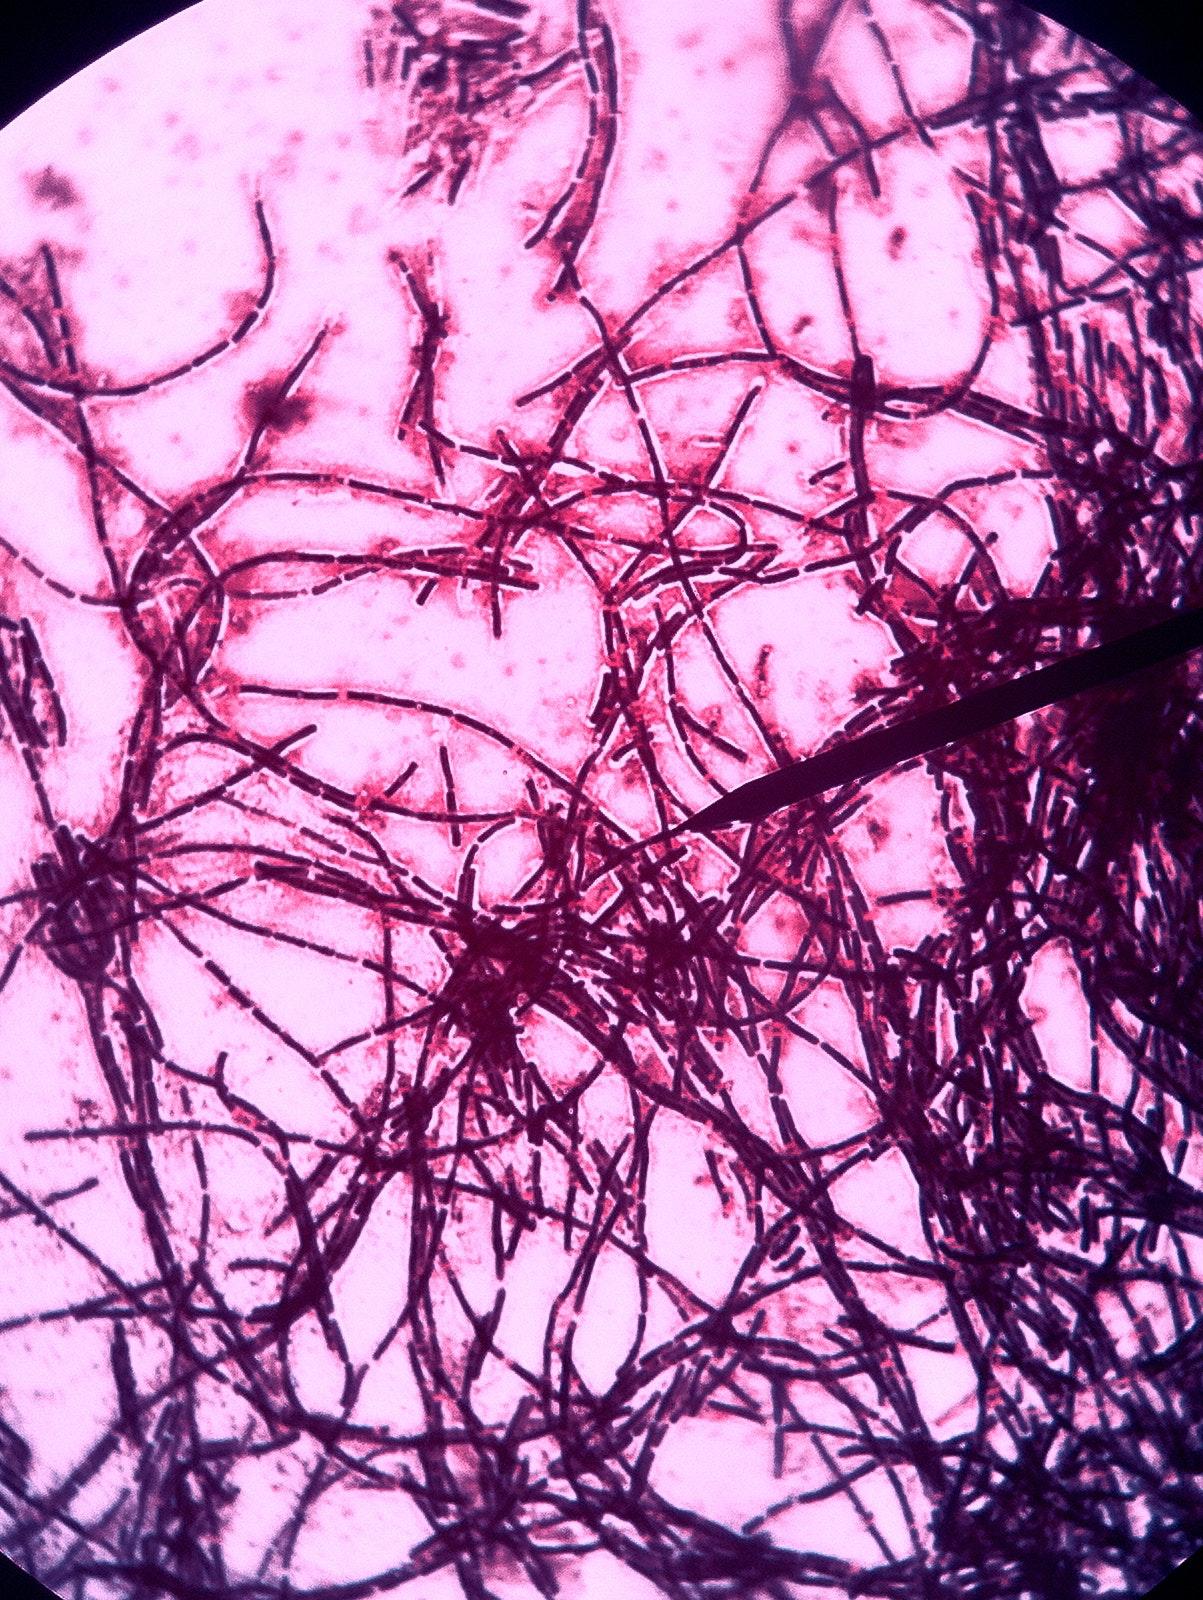 Bacillus Subtillis